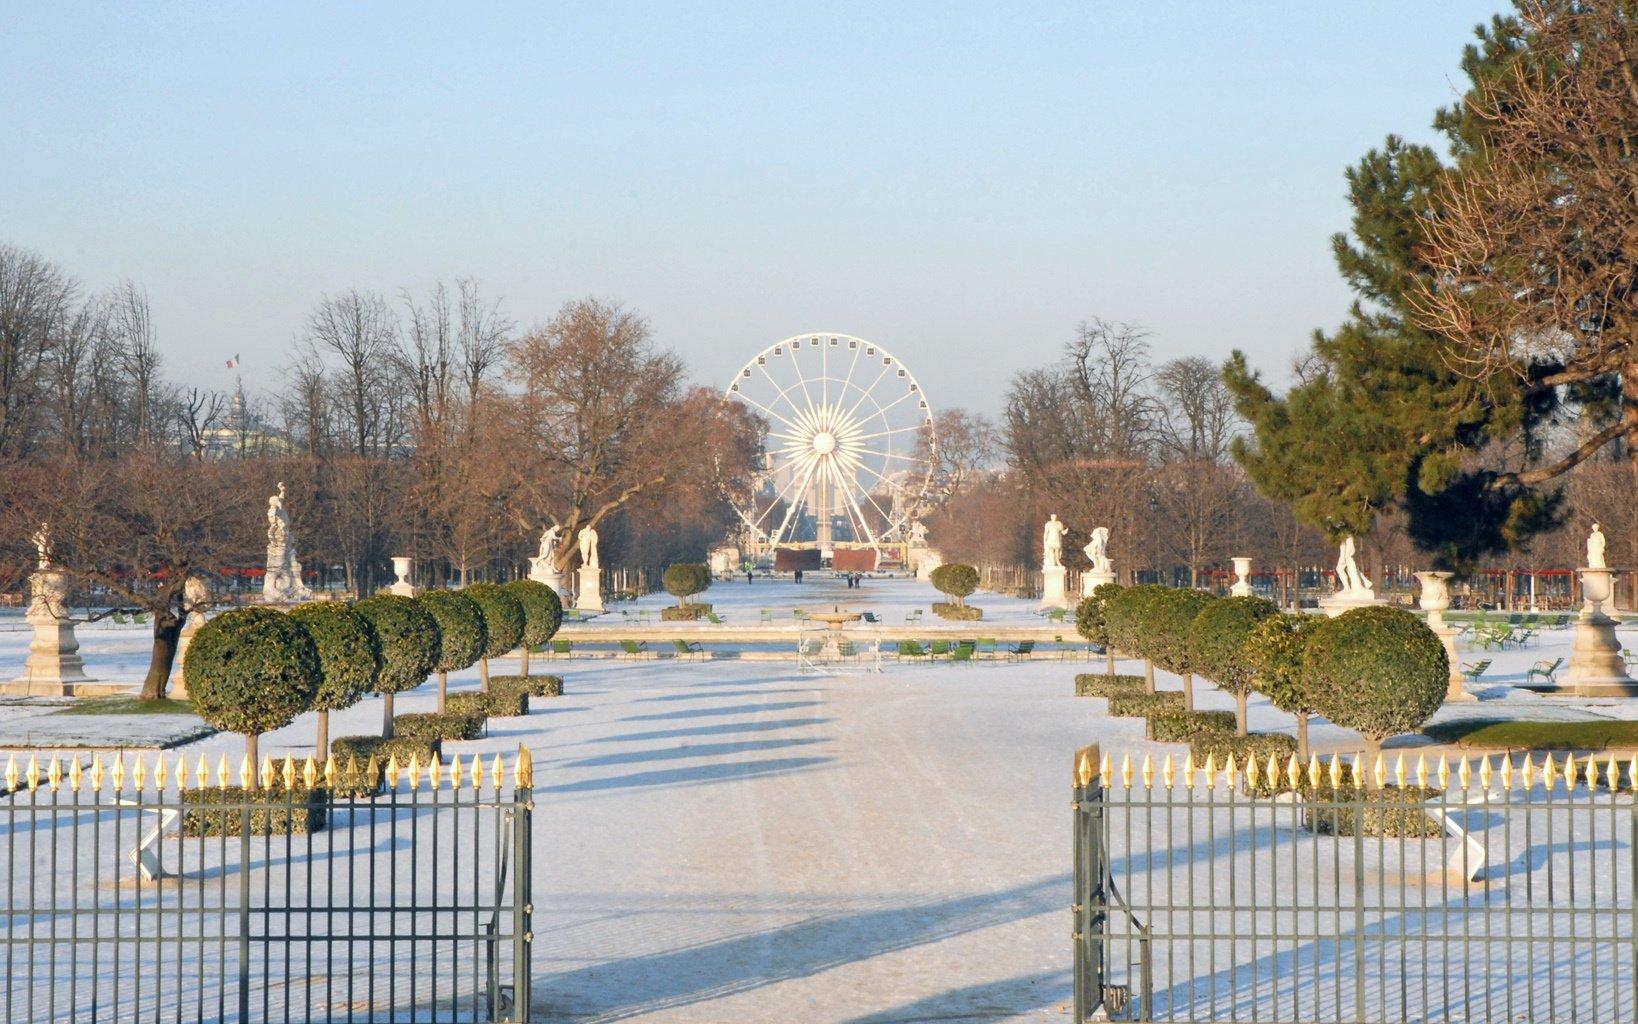 fileparis grande alle du jardin des tuileries sous la neigejpg - Allee De Jardin